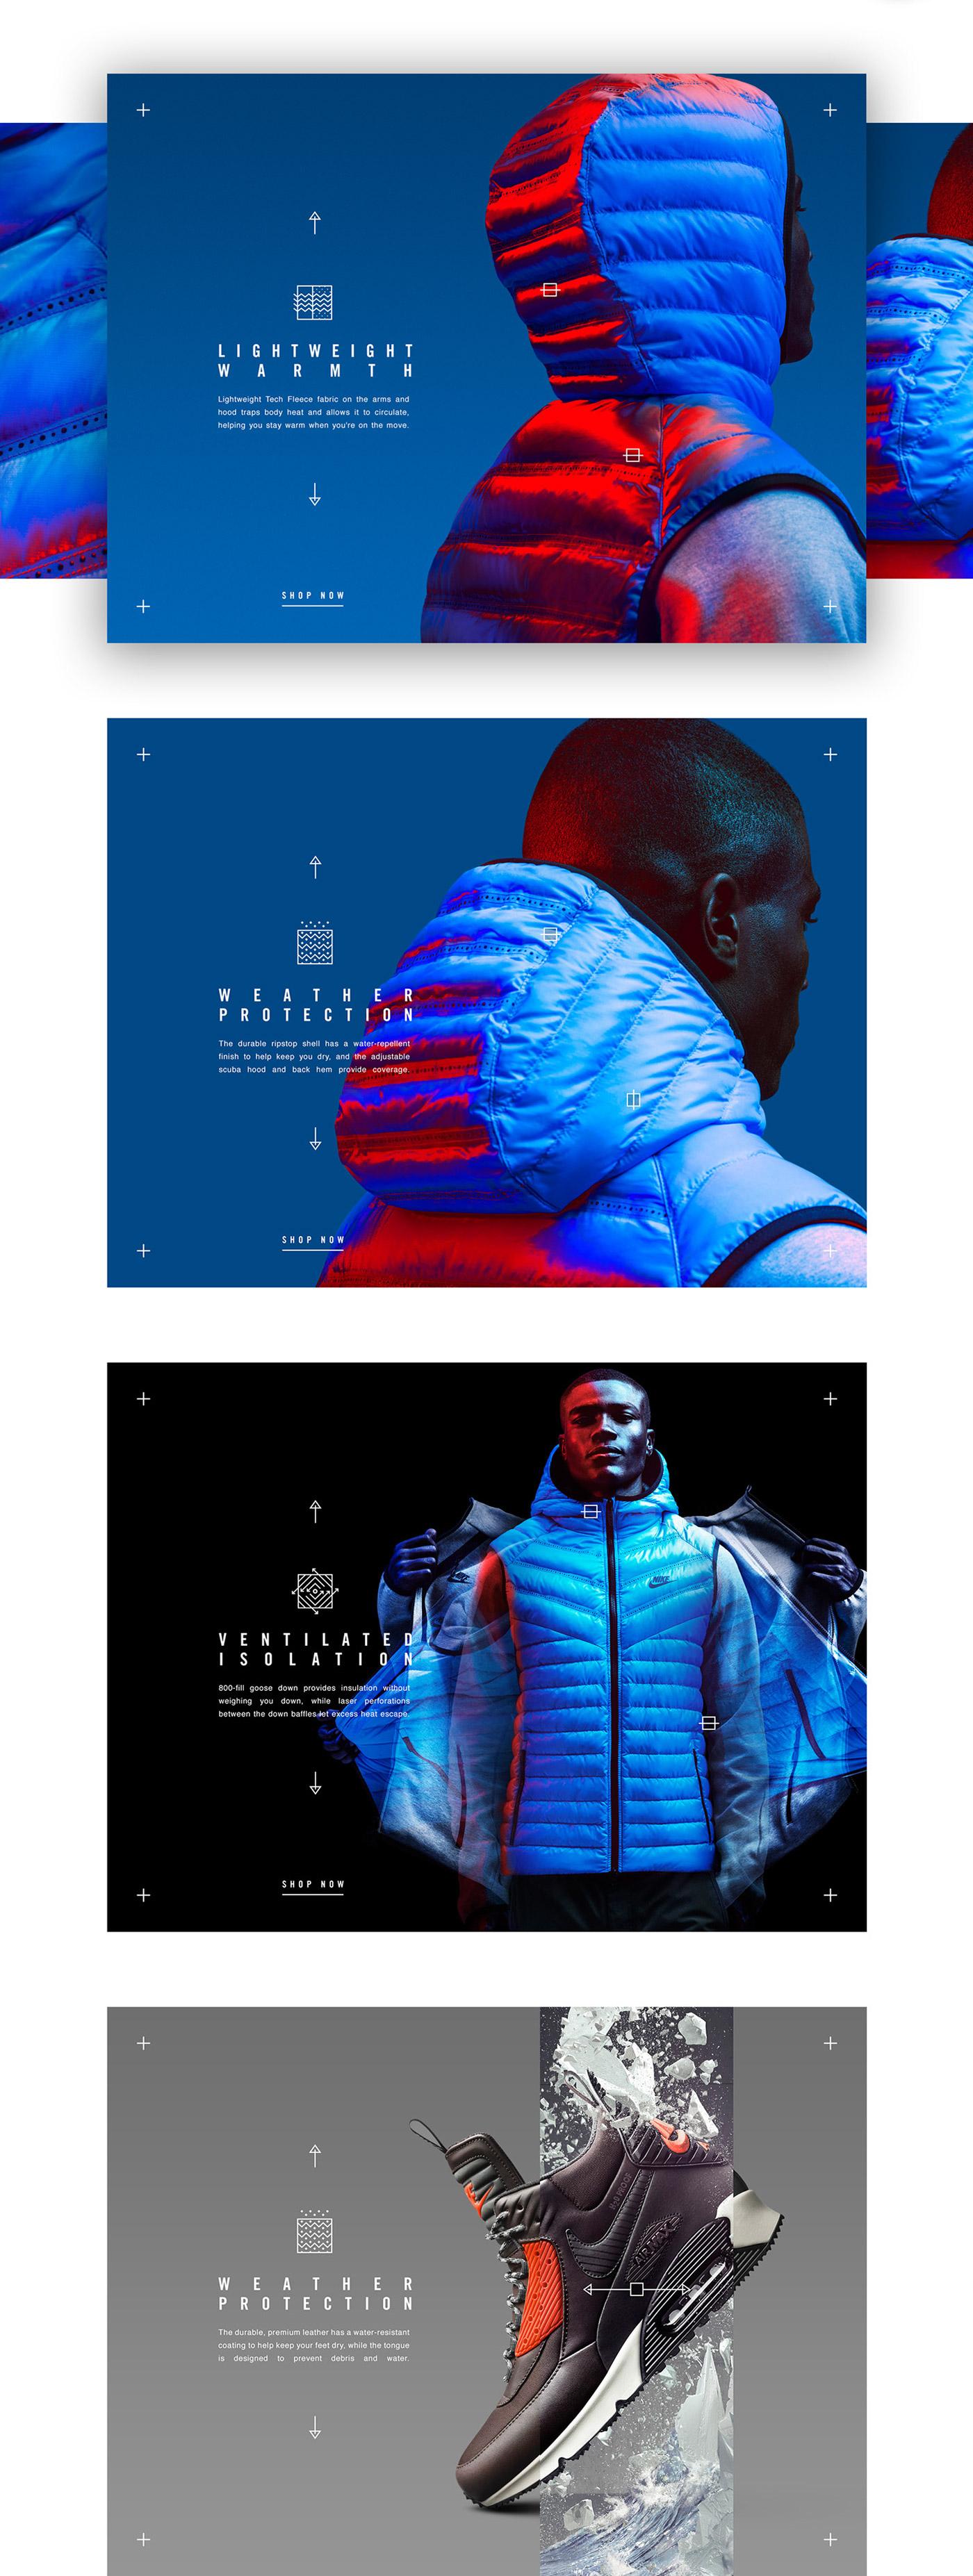 Nike Tech Pack in store app on